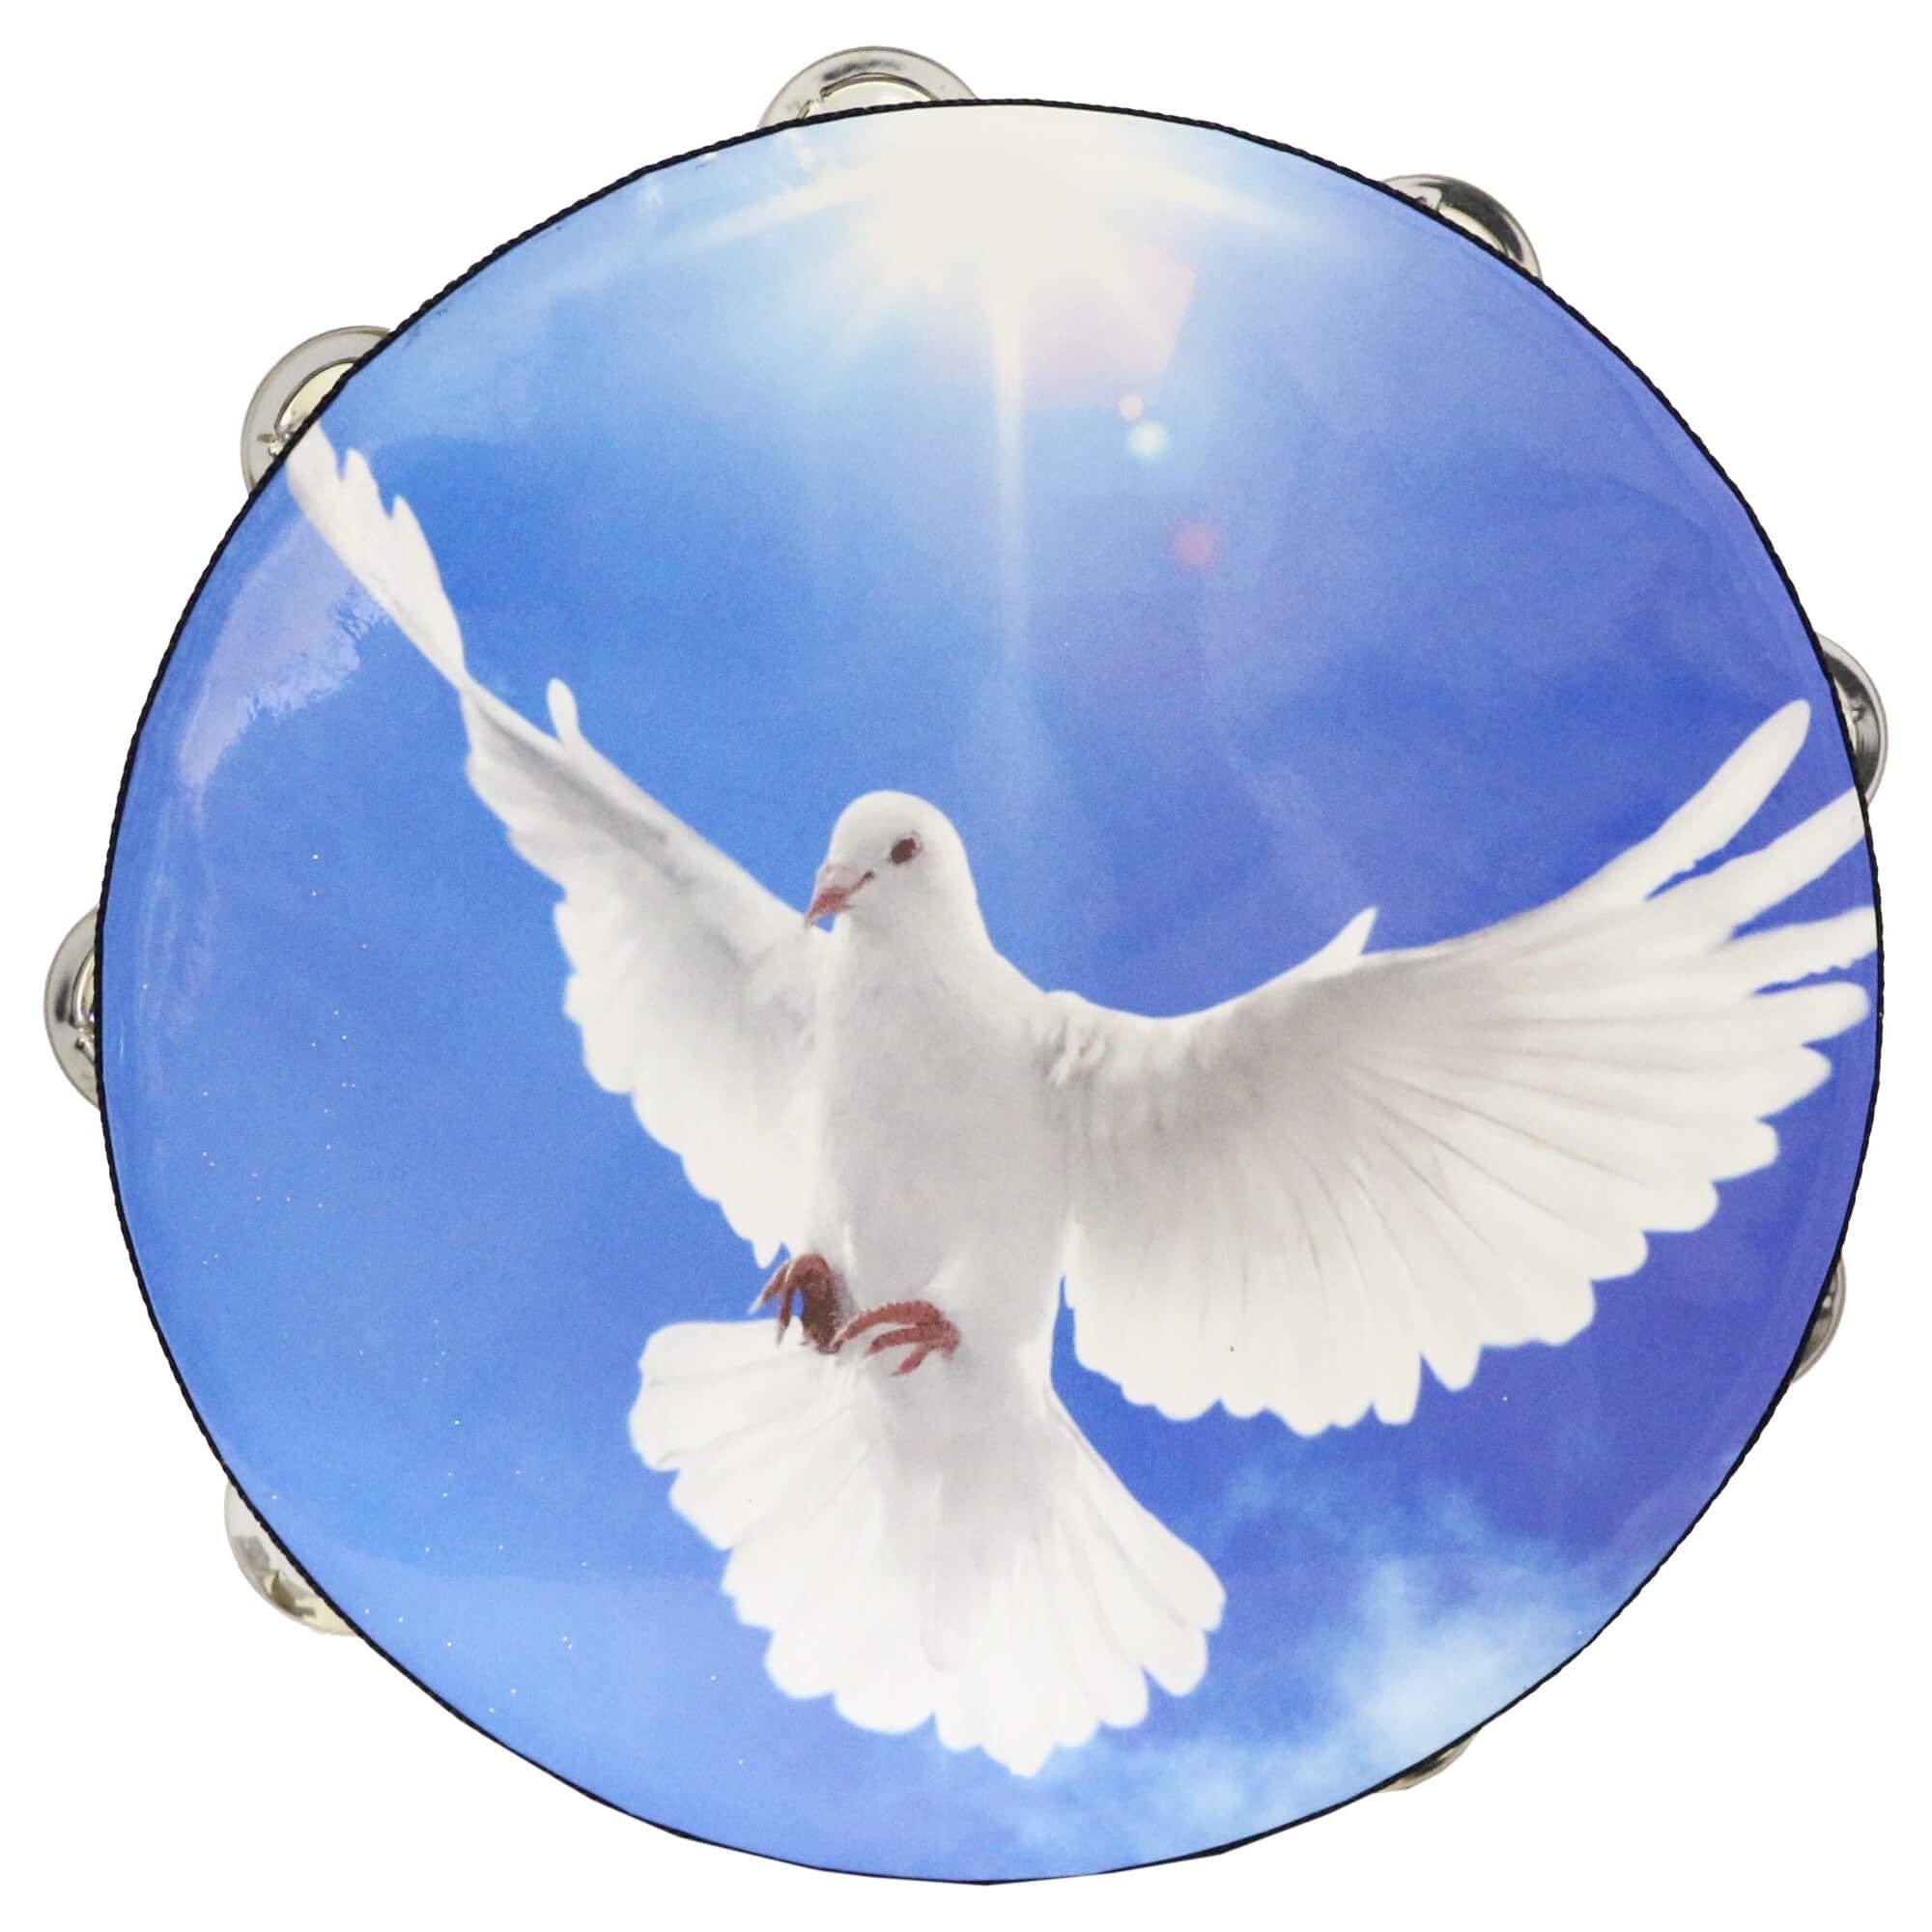 Danzcue 10 Inches Worship Dove Double Rows Jingles Tambourine